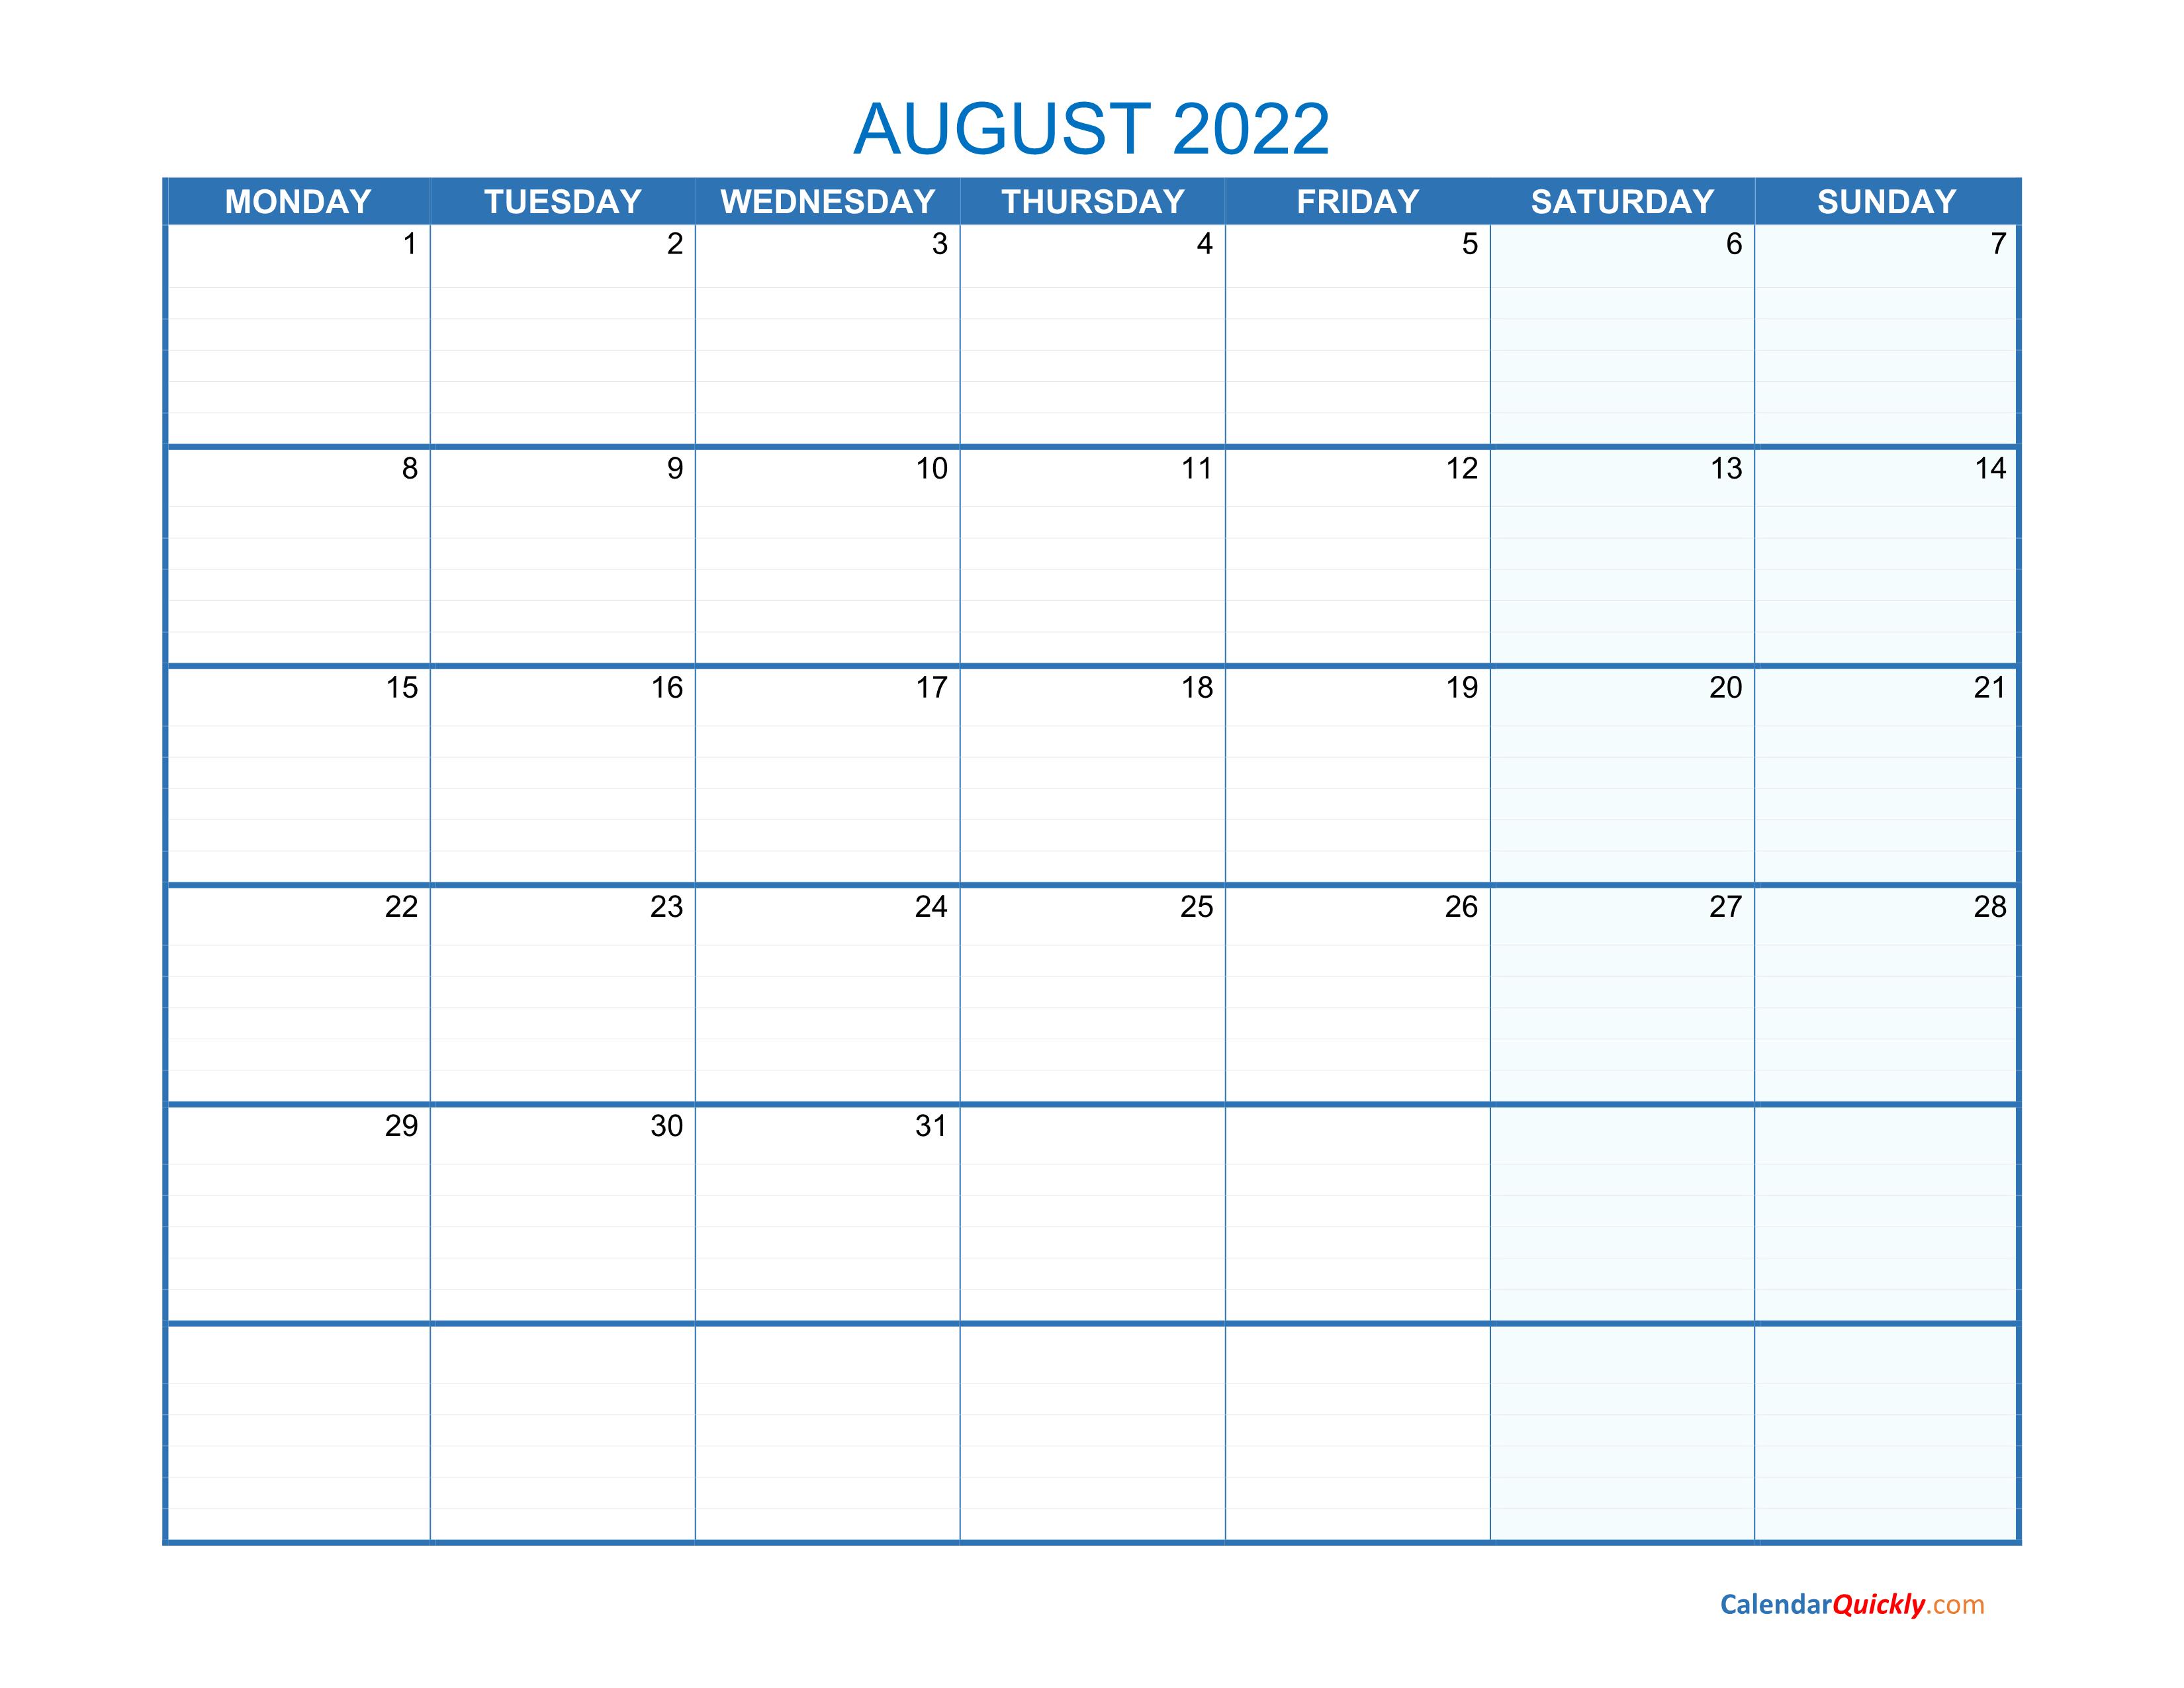 August Monday 2022 Blank Calendar | Calendar Quickly